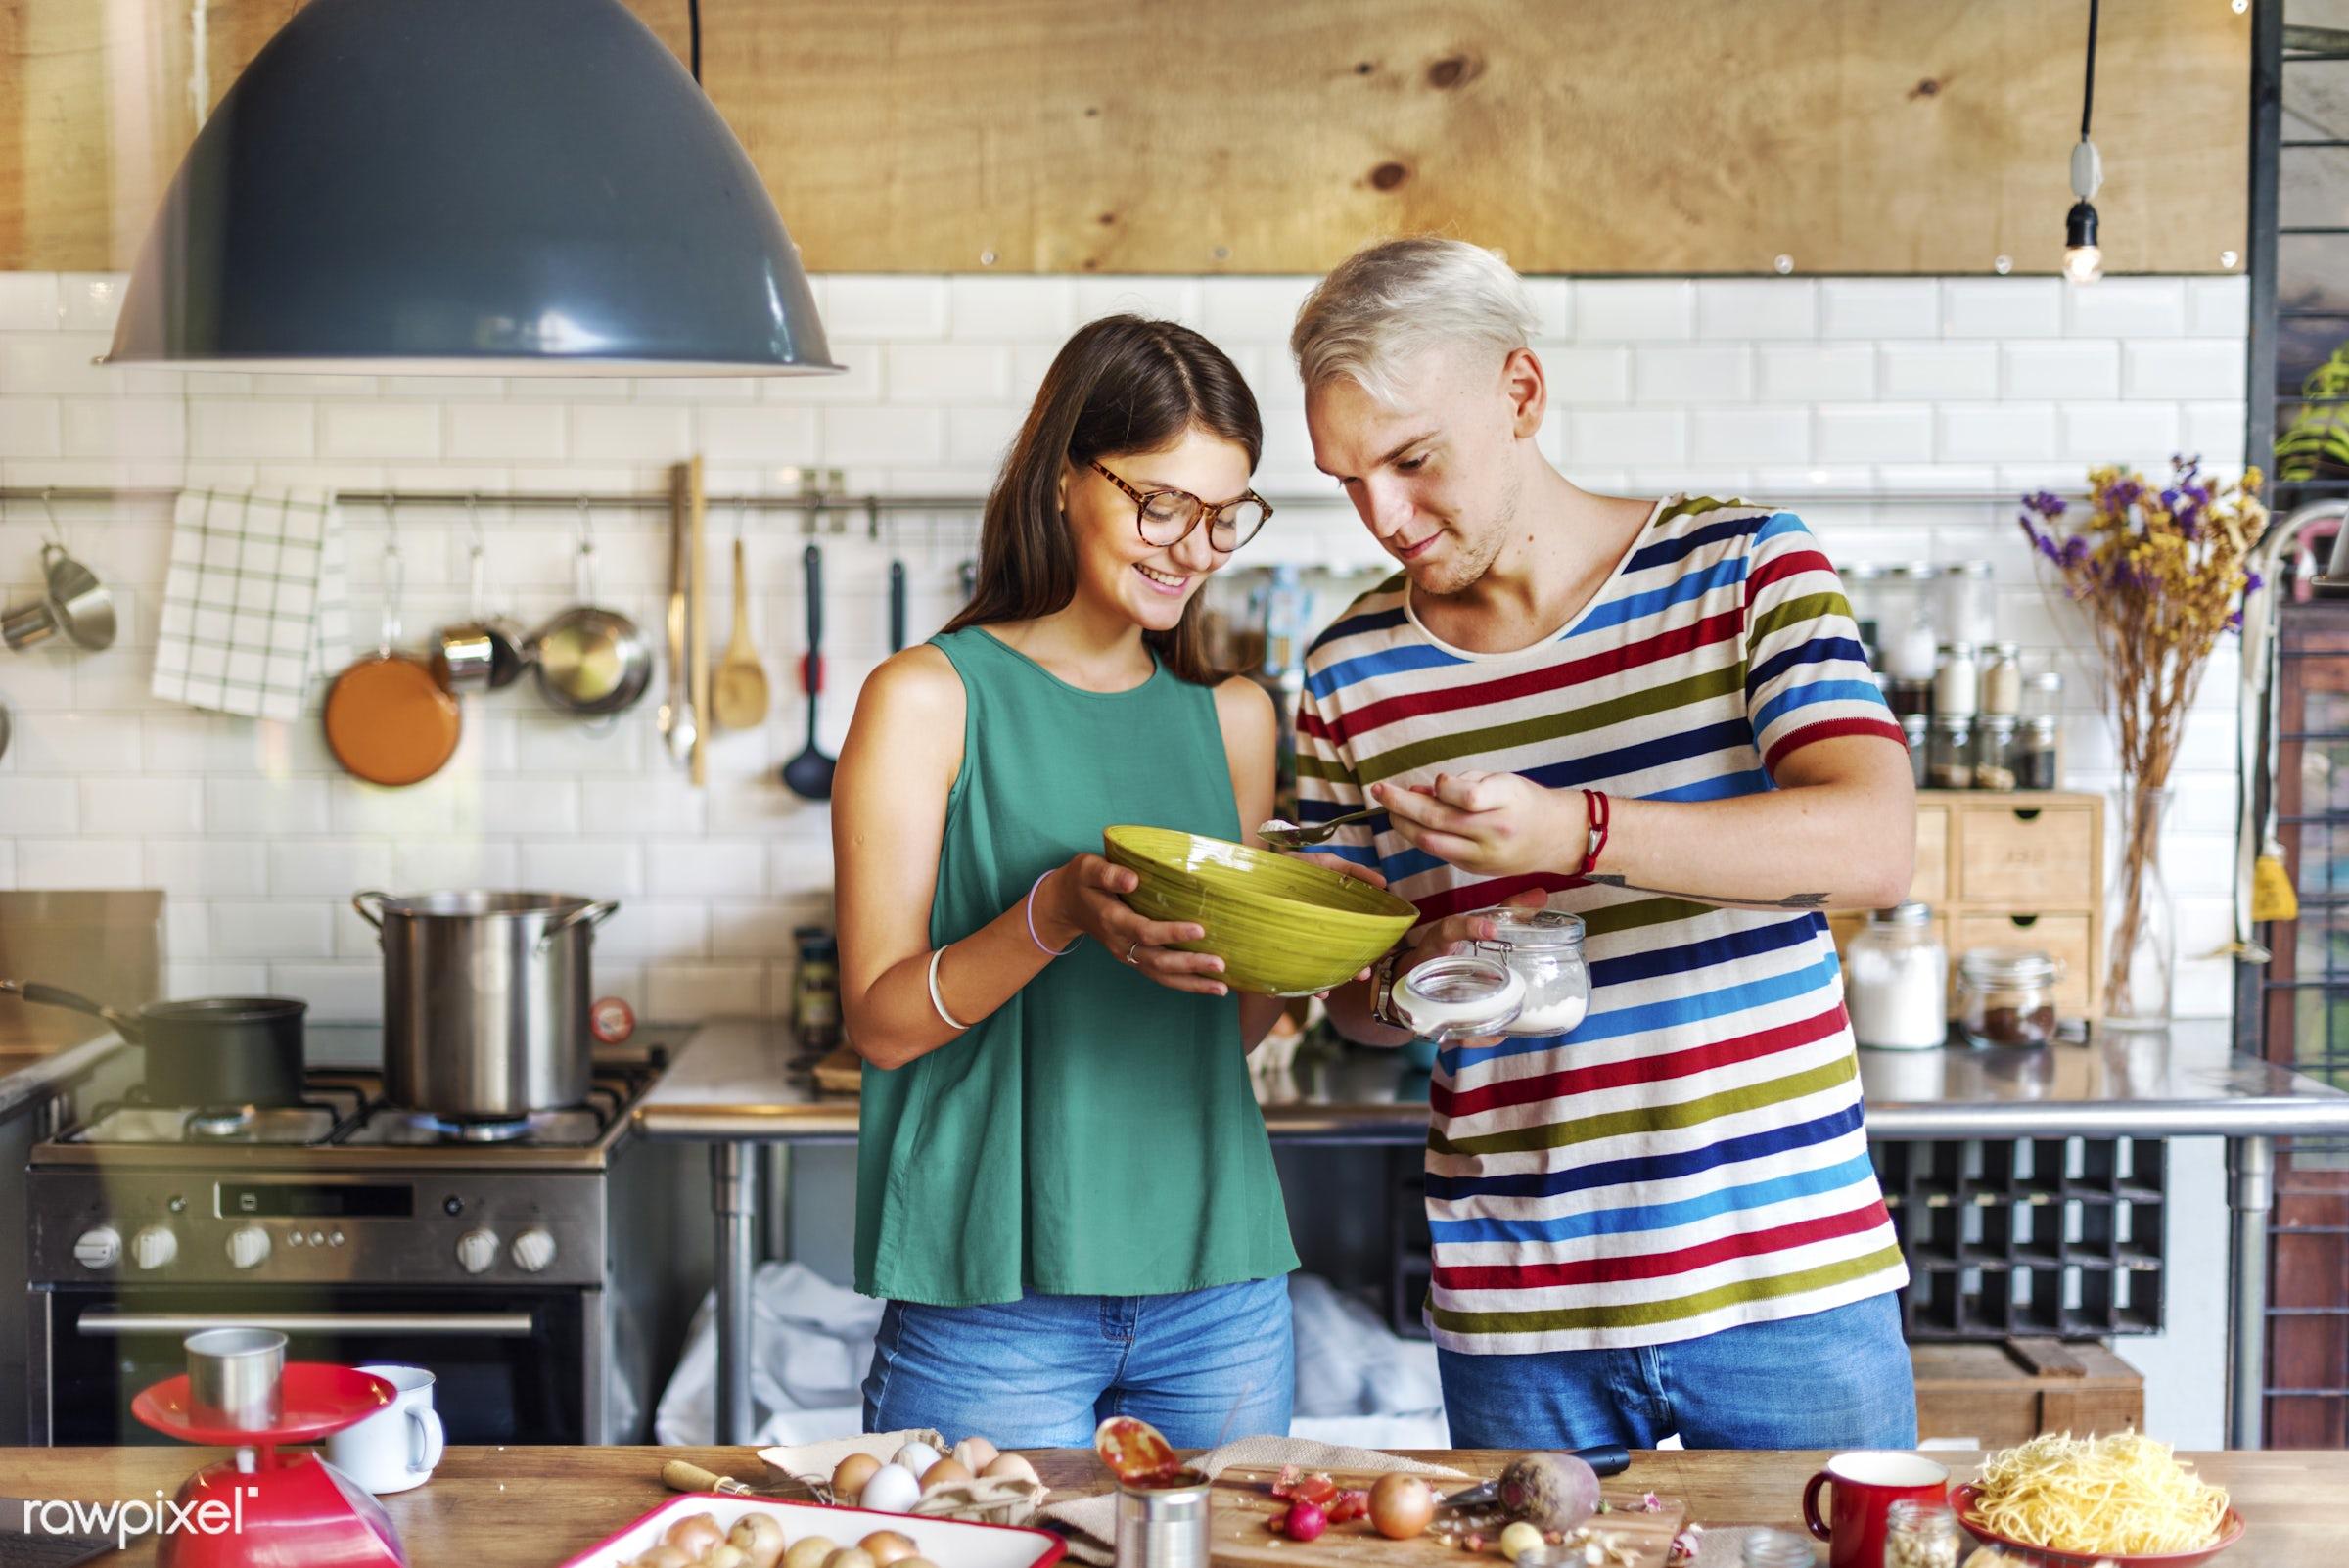 activity, bonding, boyfriend, breakfast, casual, cheerful, couple, cuisine, culinary, dietary, dinner, eating, enjoyment,...